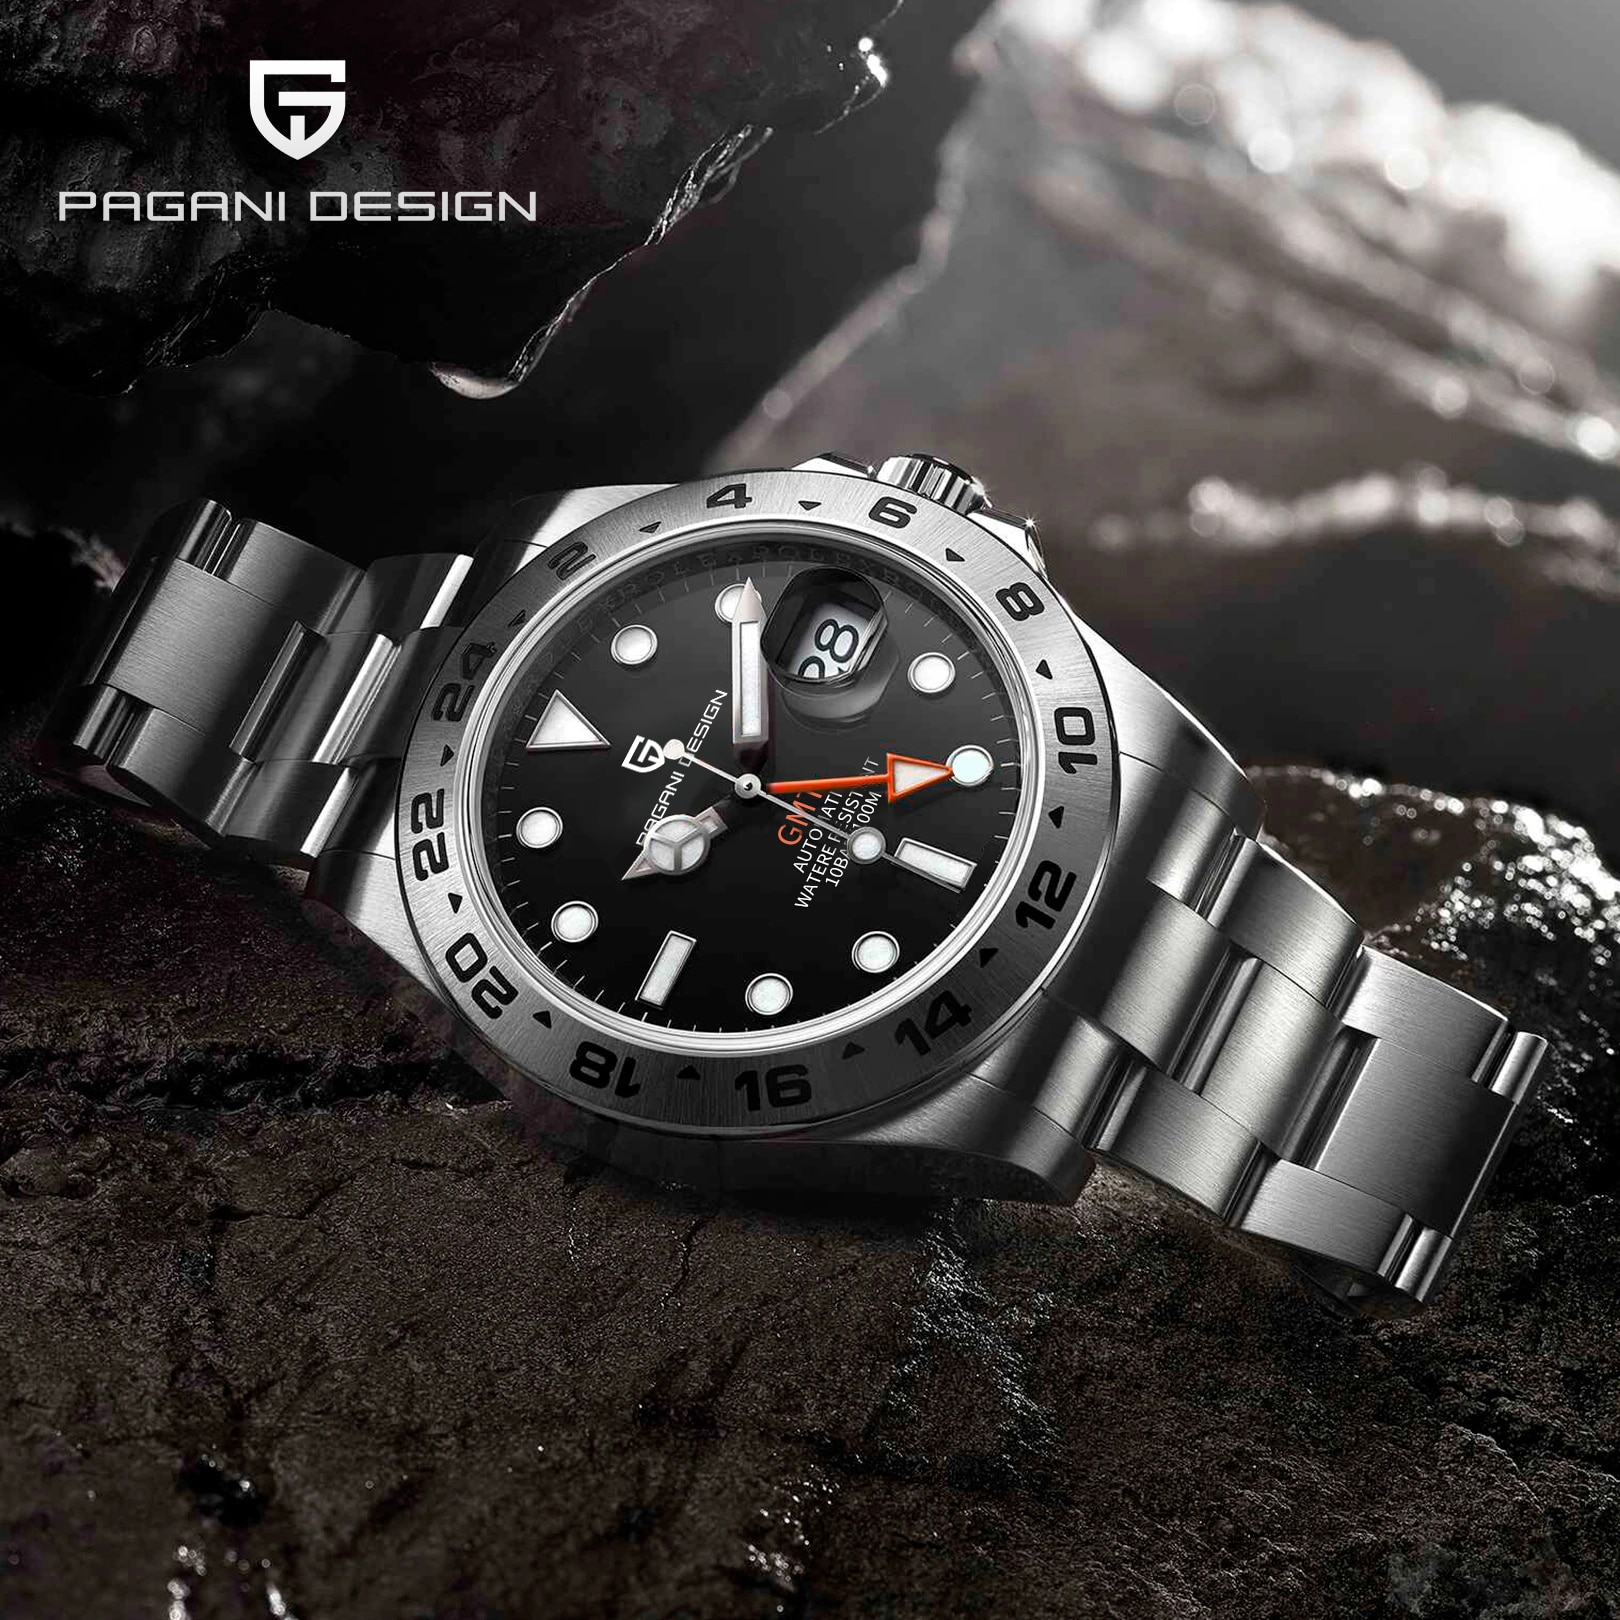 2021 New PAGANI DESIGN Men's Mechanical Watches Brand Luxury GMT Automatic Watches Men Waterproof Wristwatch Relogio Masculino